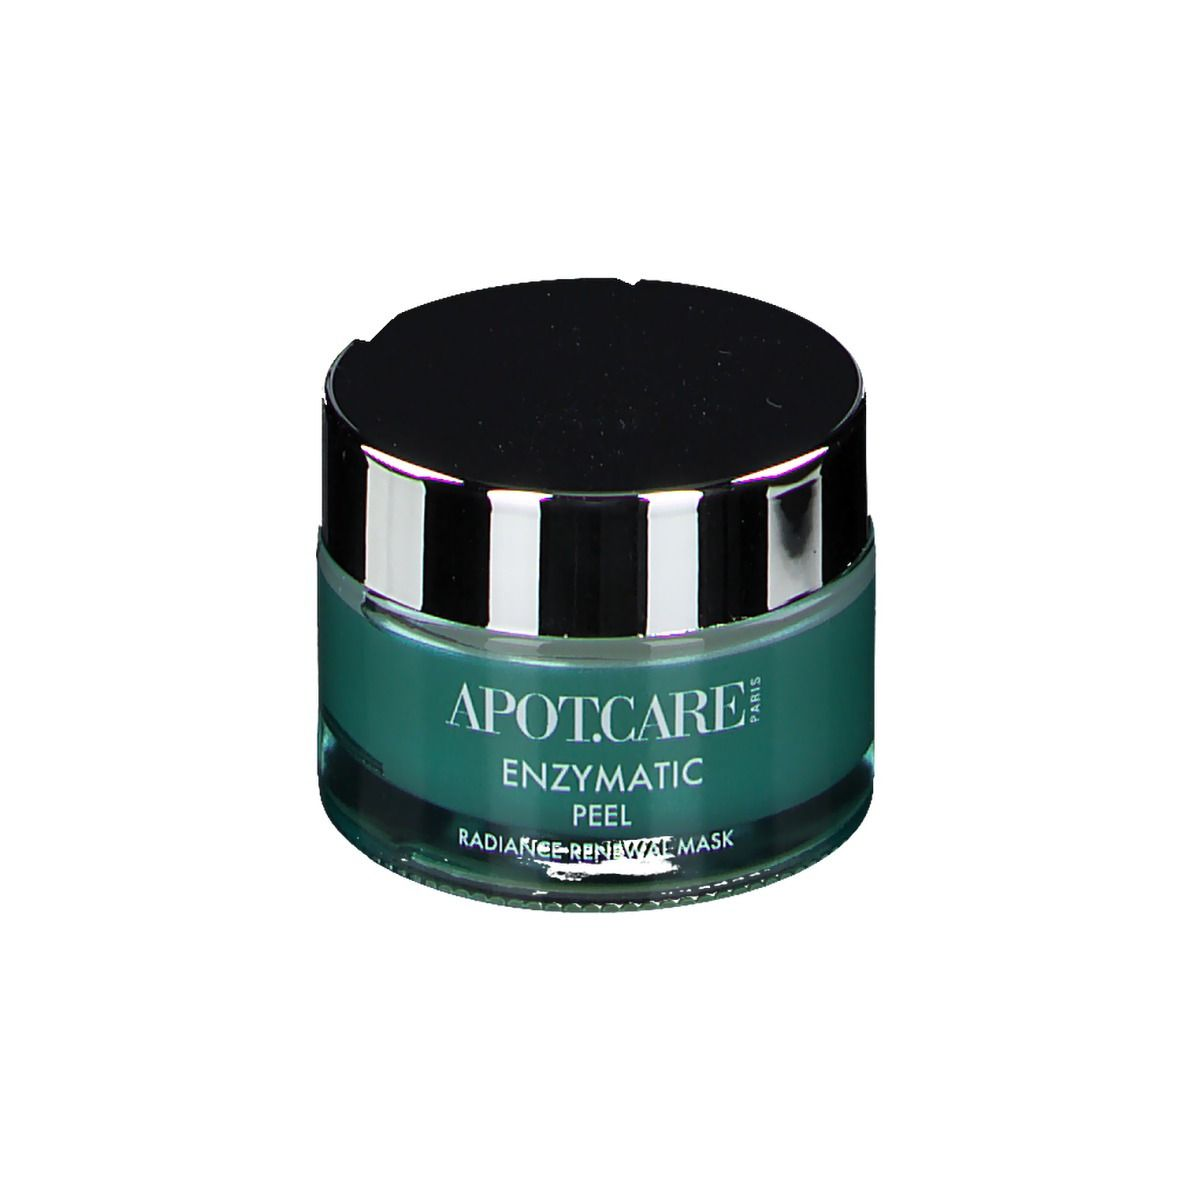 Image of APOT.CARE Enzymatic Peel Maske